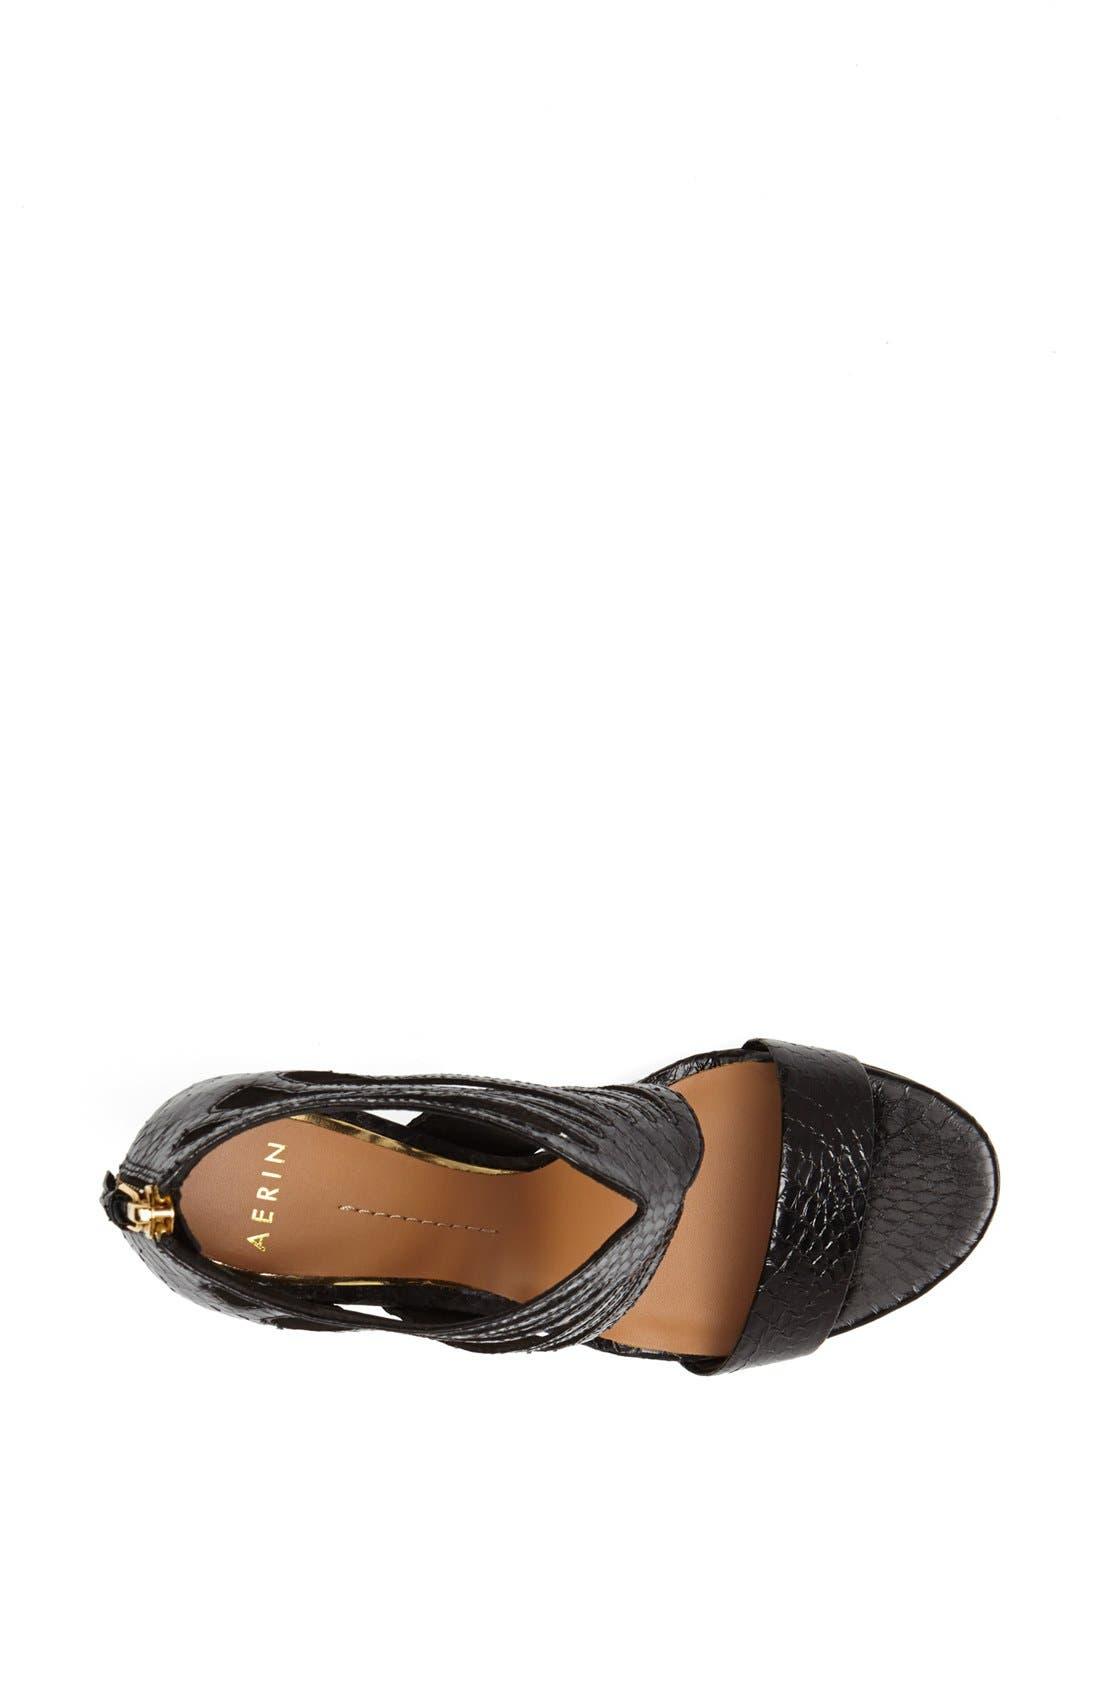 Alternate Image 3  - Aerin 'Chiara' Genuine Snakeskin Sandal